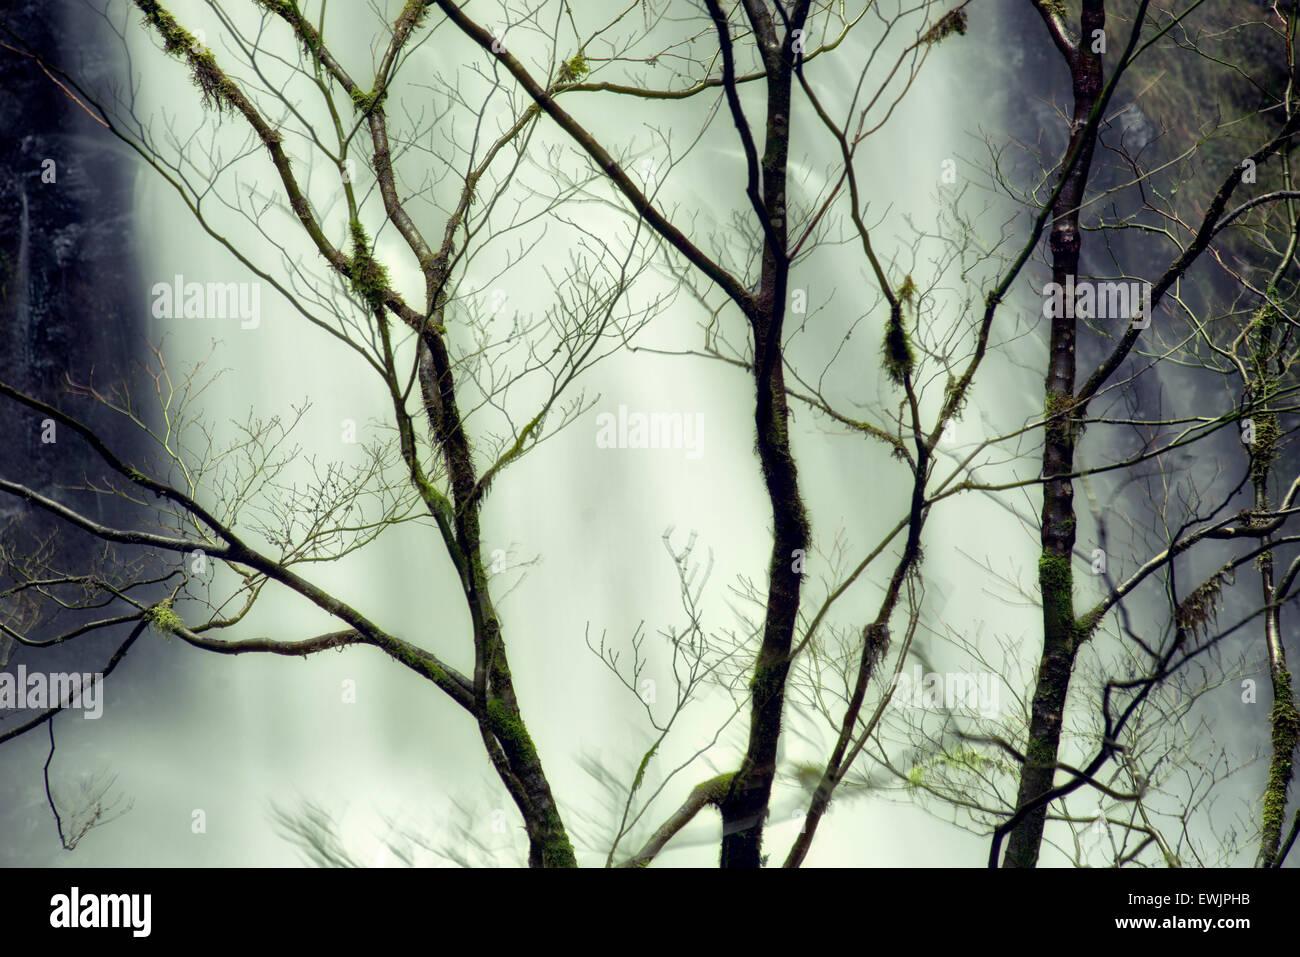 Doppel-Falls eine mit nackten Winterbäume. Silver Falls State Park, Oregon Stockbild